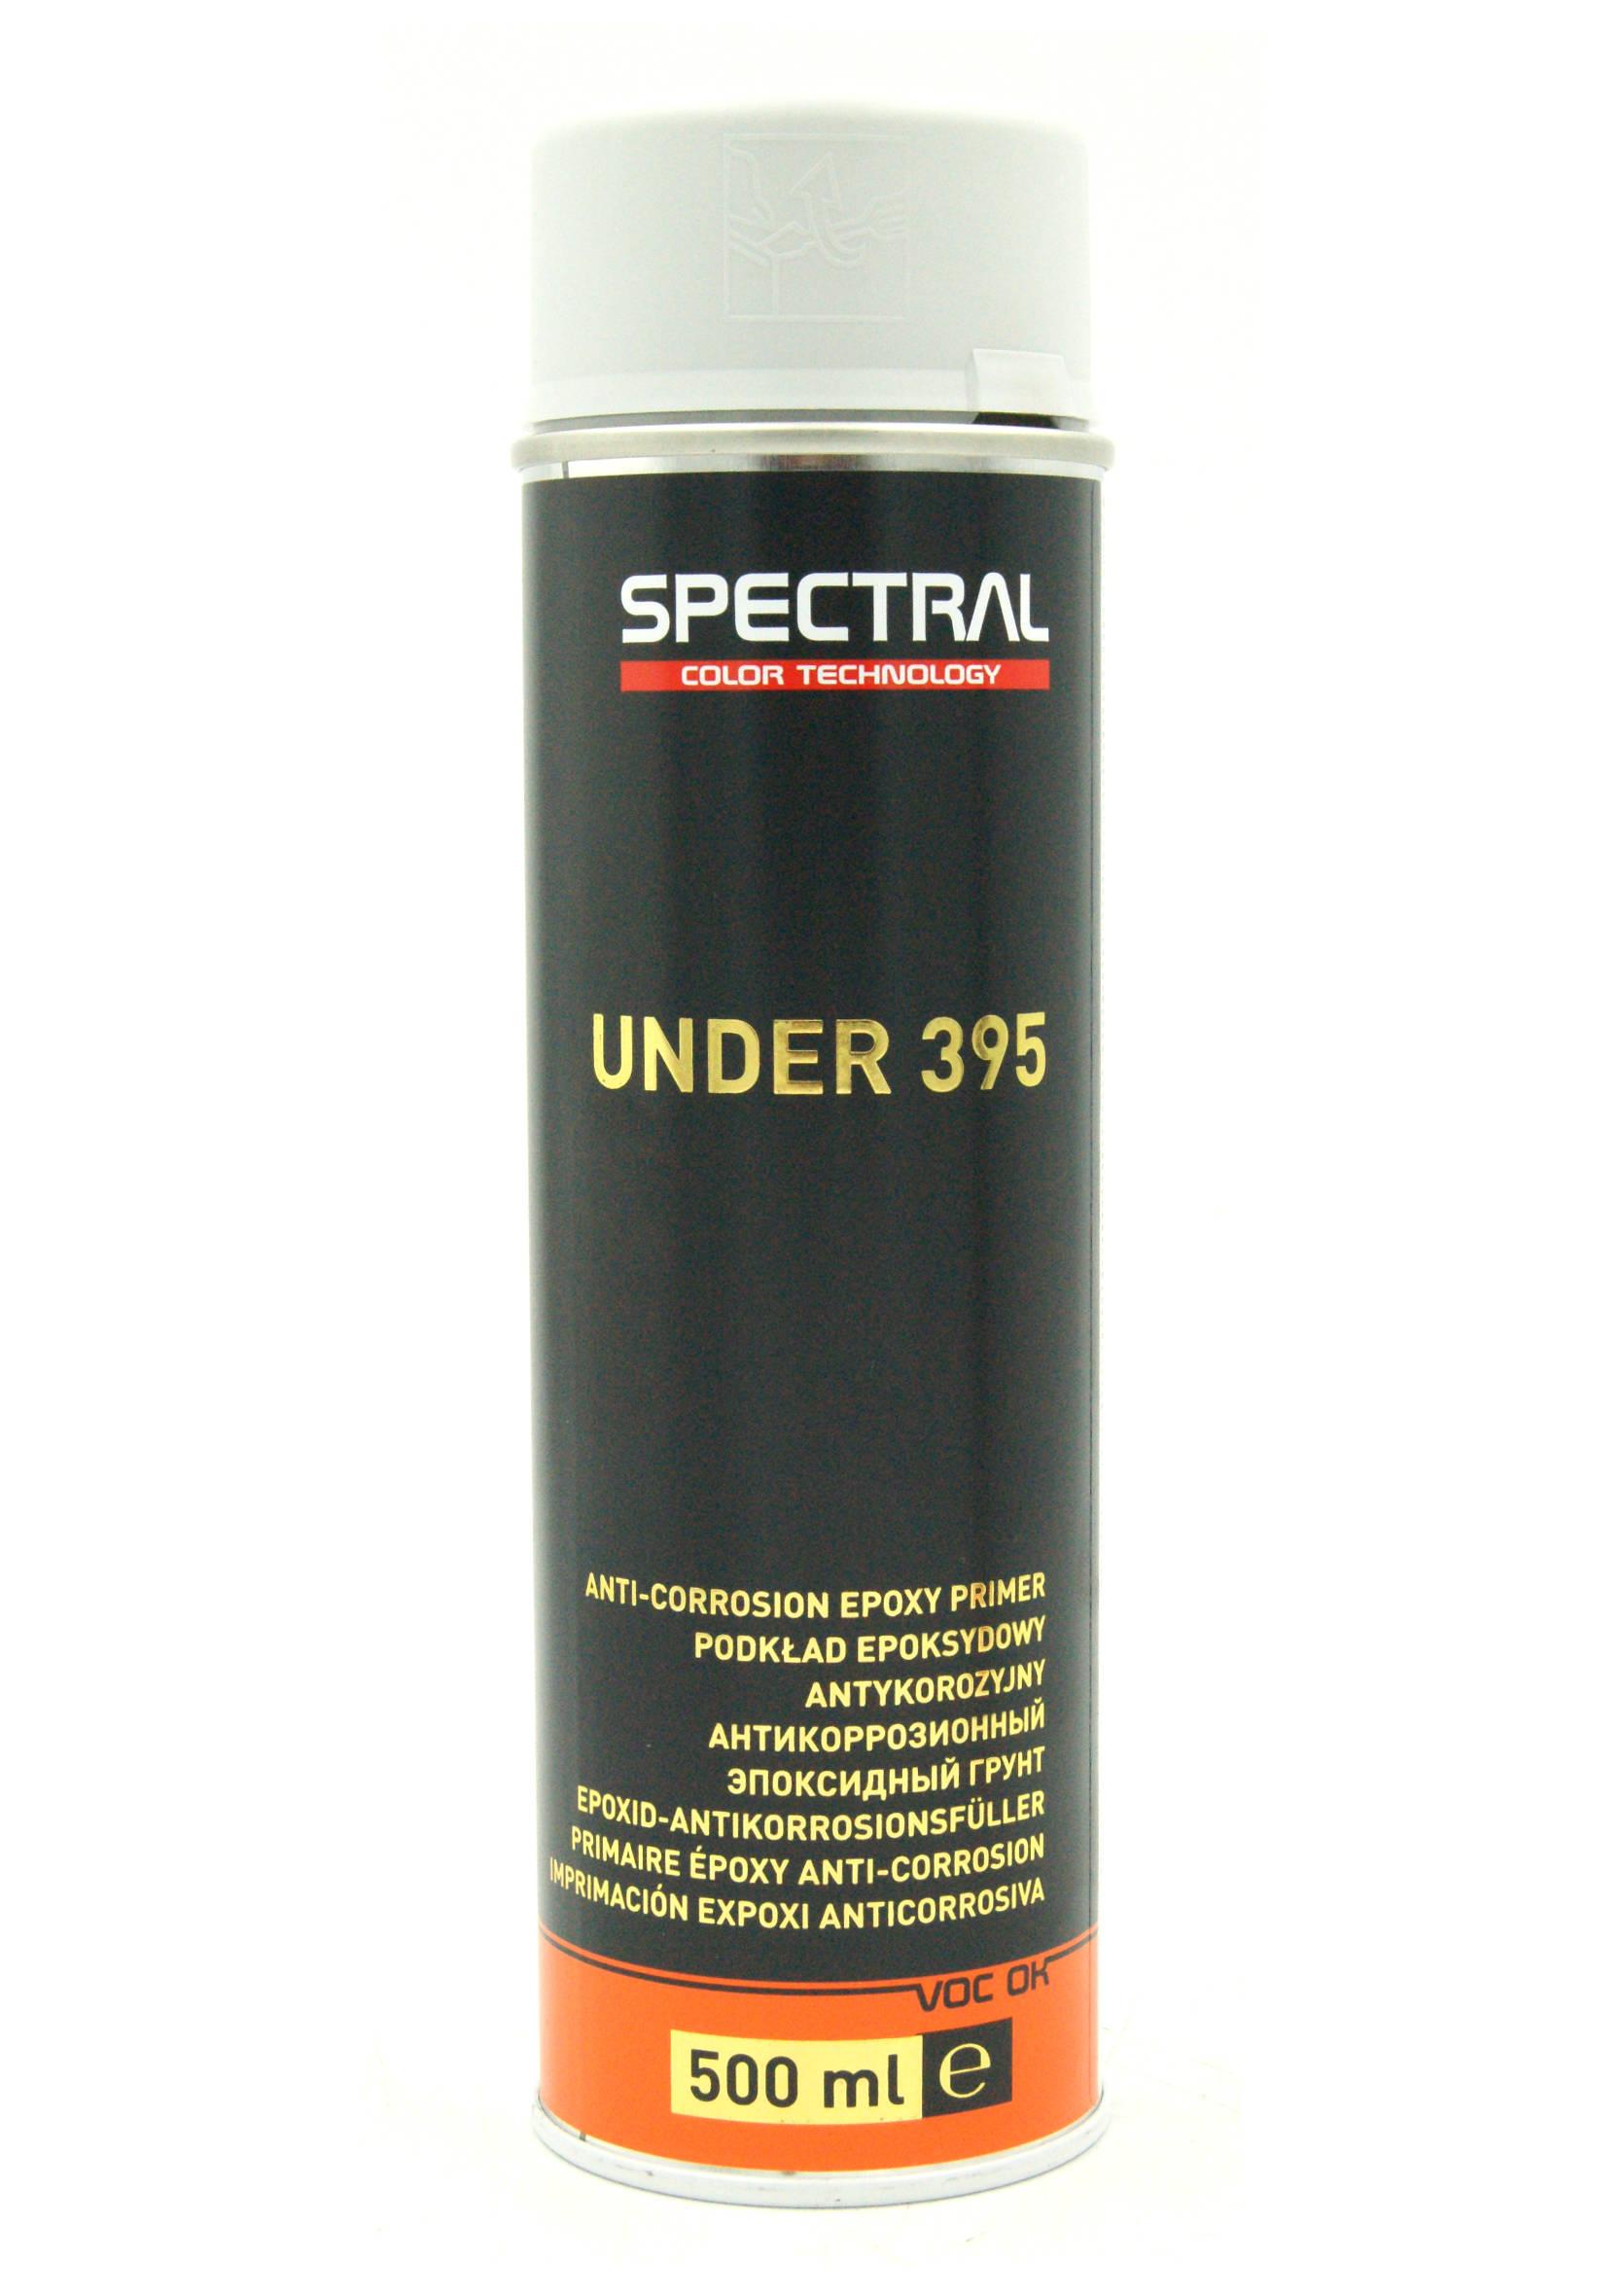 Spectral Under 395 Podkład Epoksydowy 500ml Szary